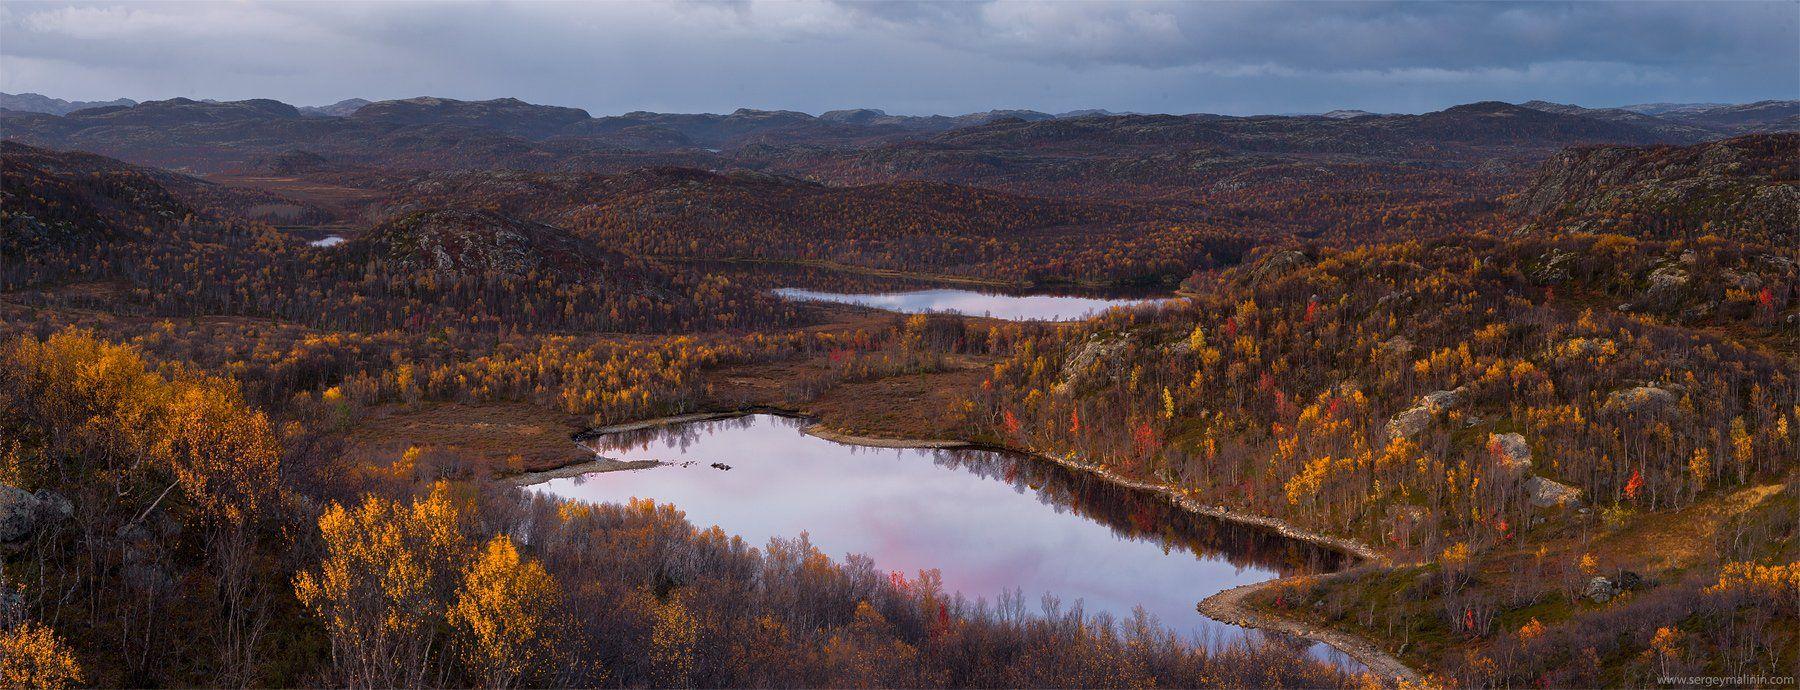 Autumn, Hill, Kola Peninsula, Кольский, Осень, Сергей Малинин